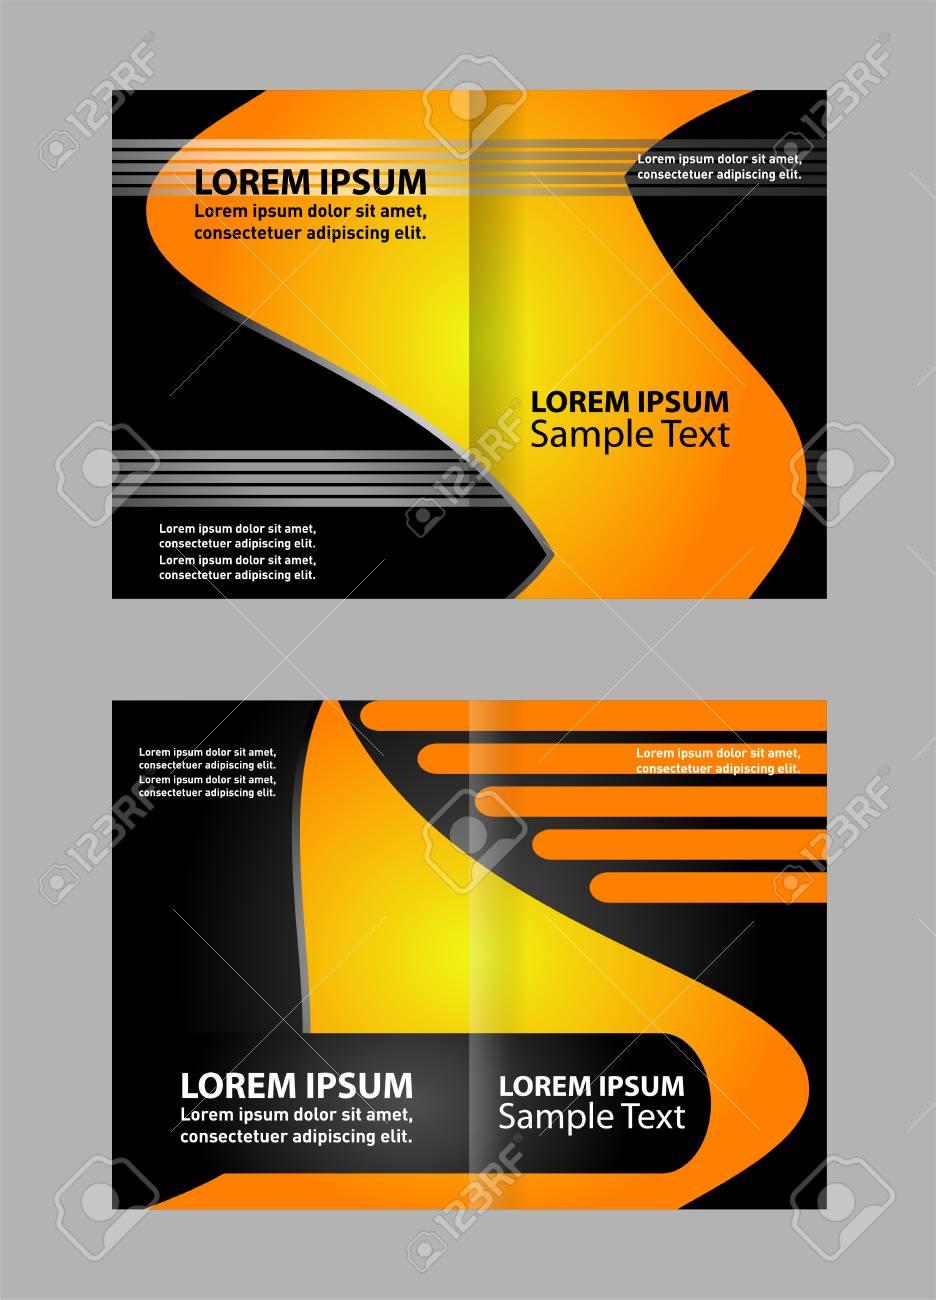 Bi-Fold Brochure Empty Vector Template Print Design, Bright Orange & Yellow  Bifold Booklet